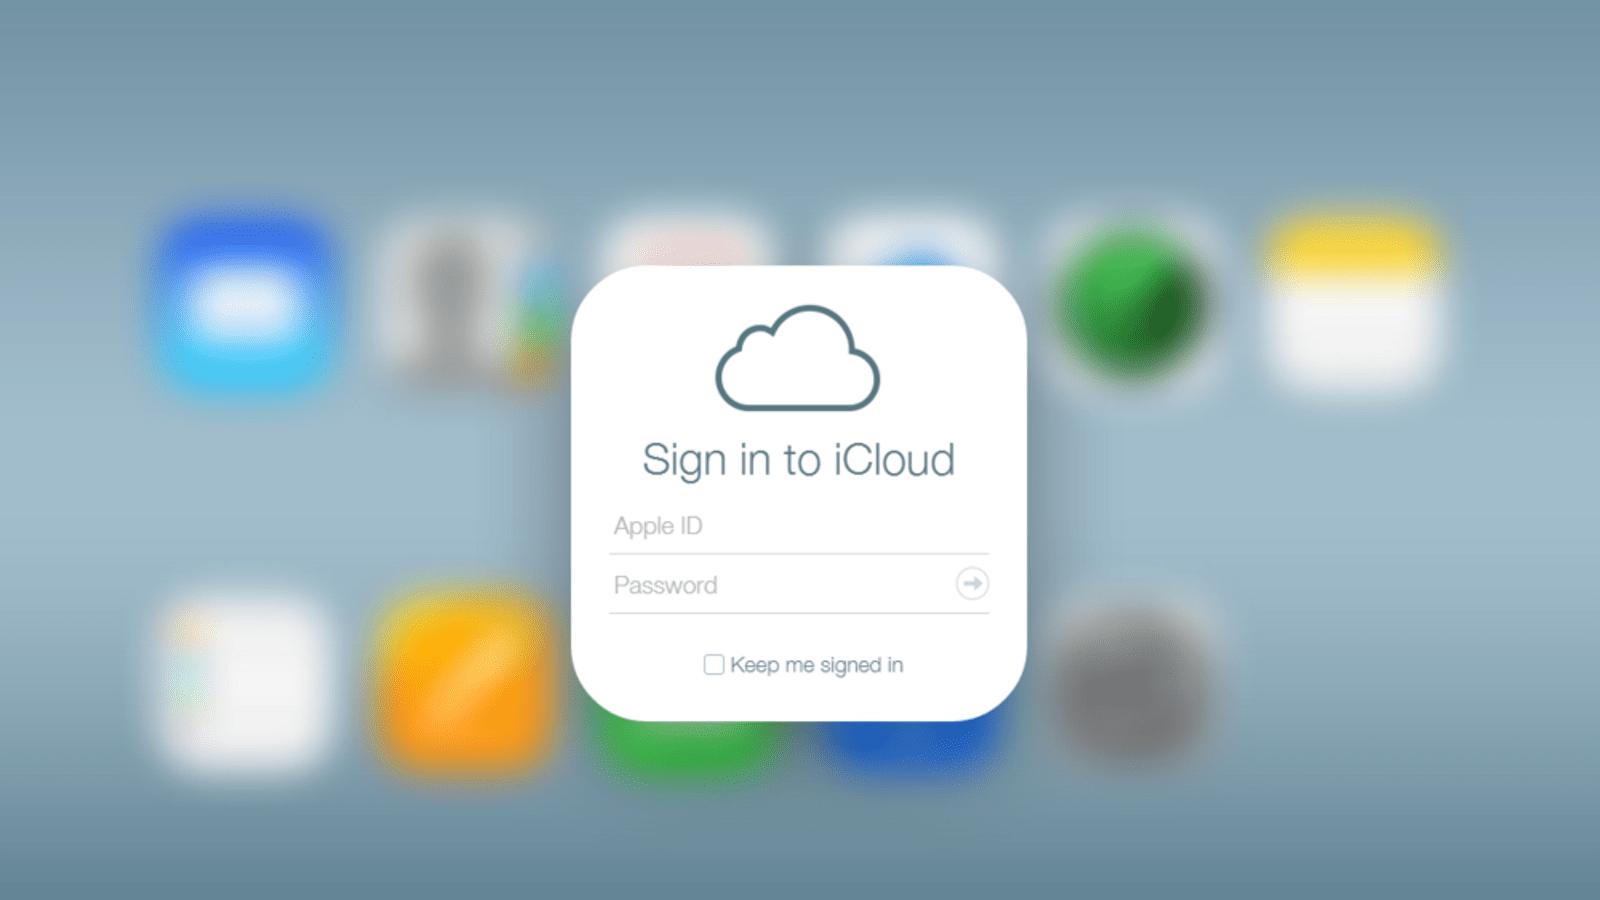 Как войти в iCloud через браузер